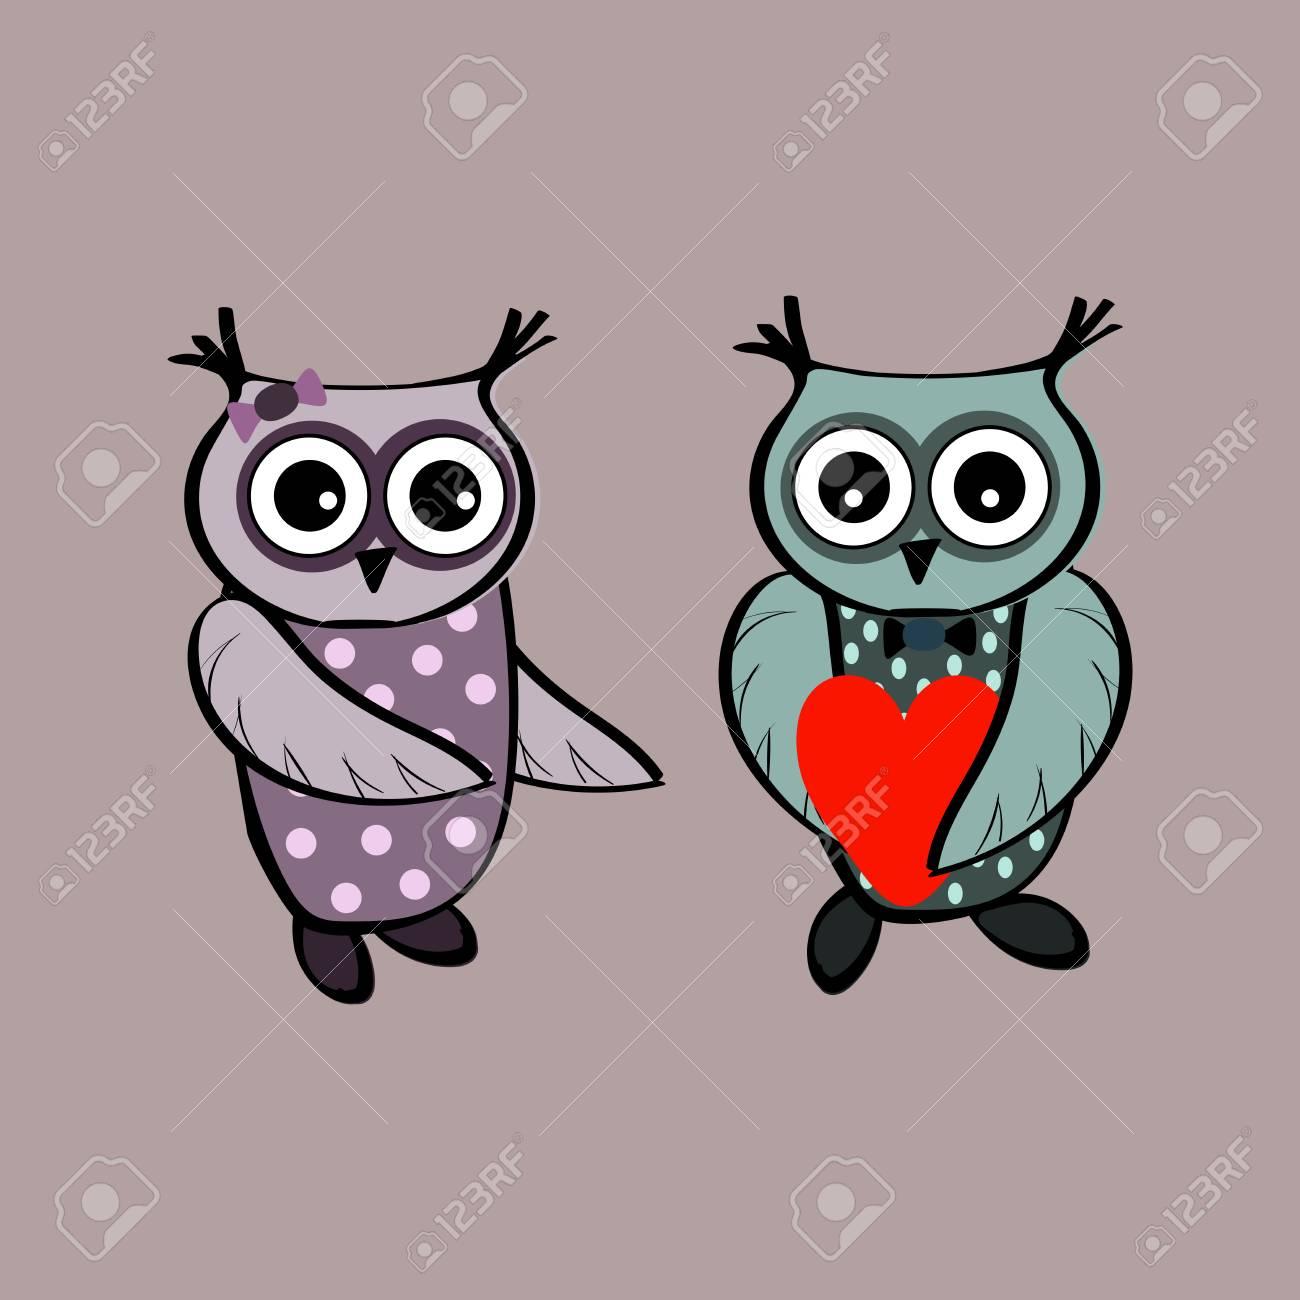 Cute Love Bird Drawing 61471 Usbdata